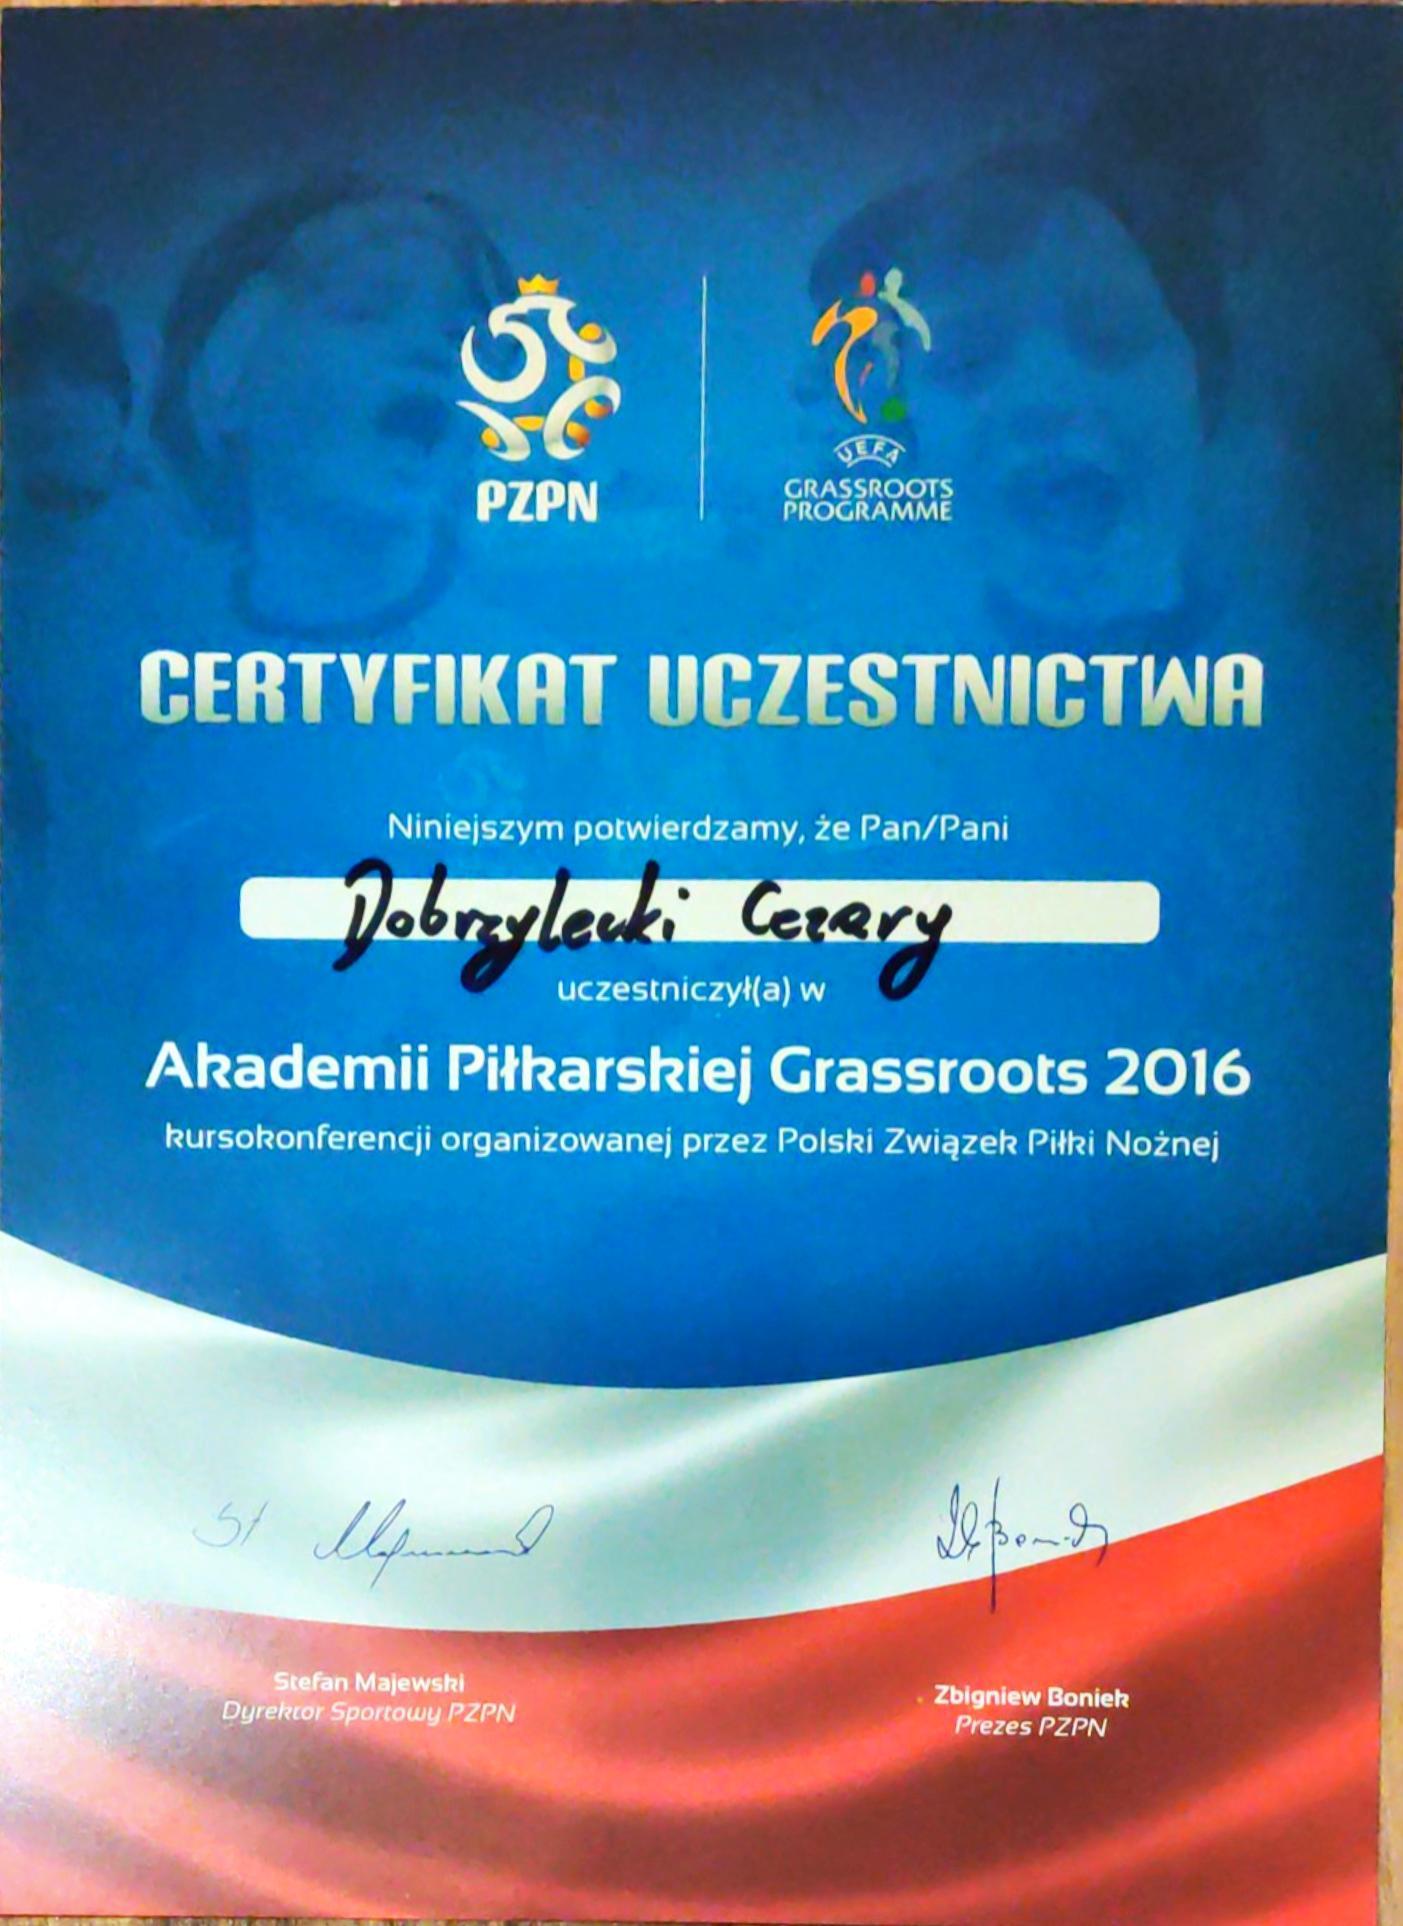 PZPN Akademia Piłkarska Grassroots certyfikat